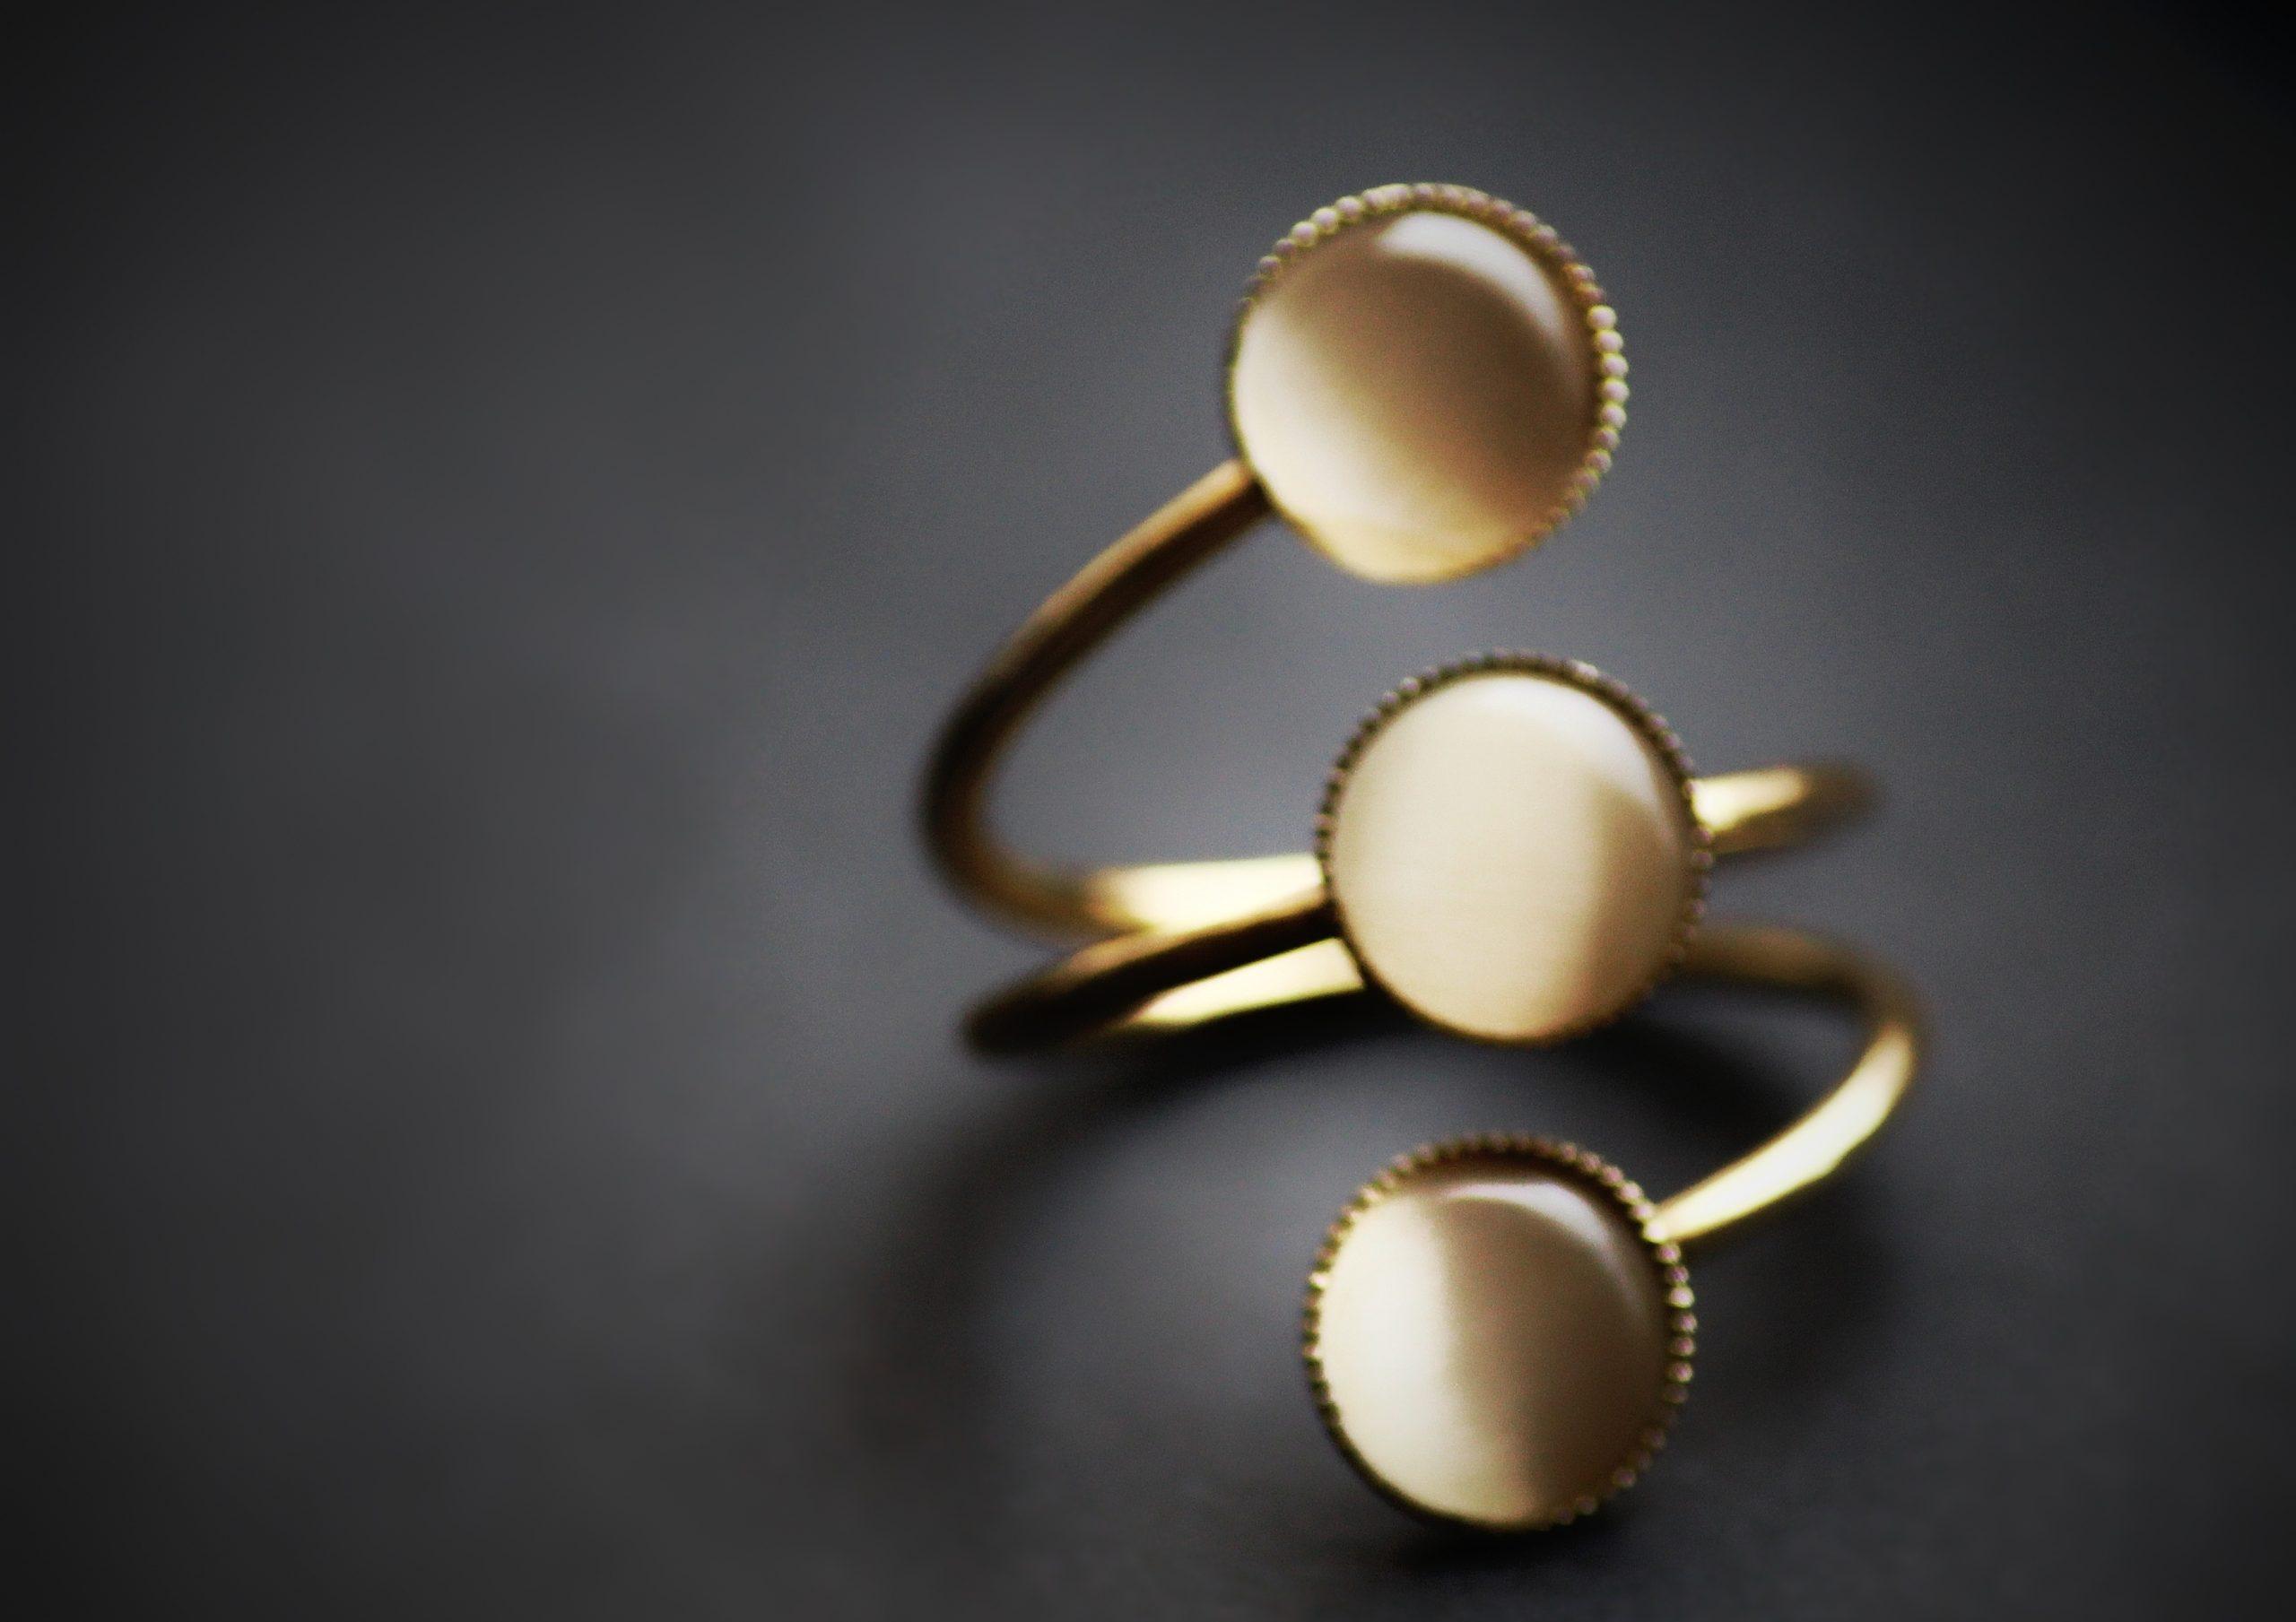 A spiral ring